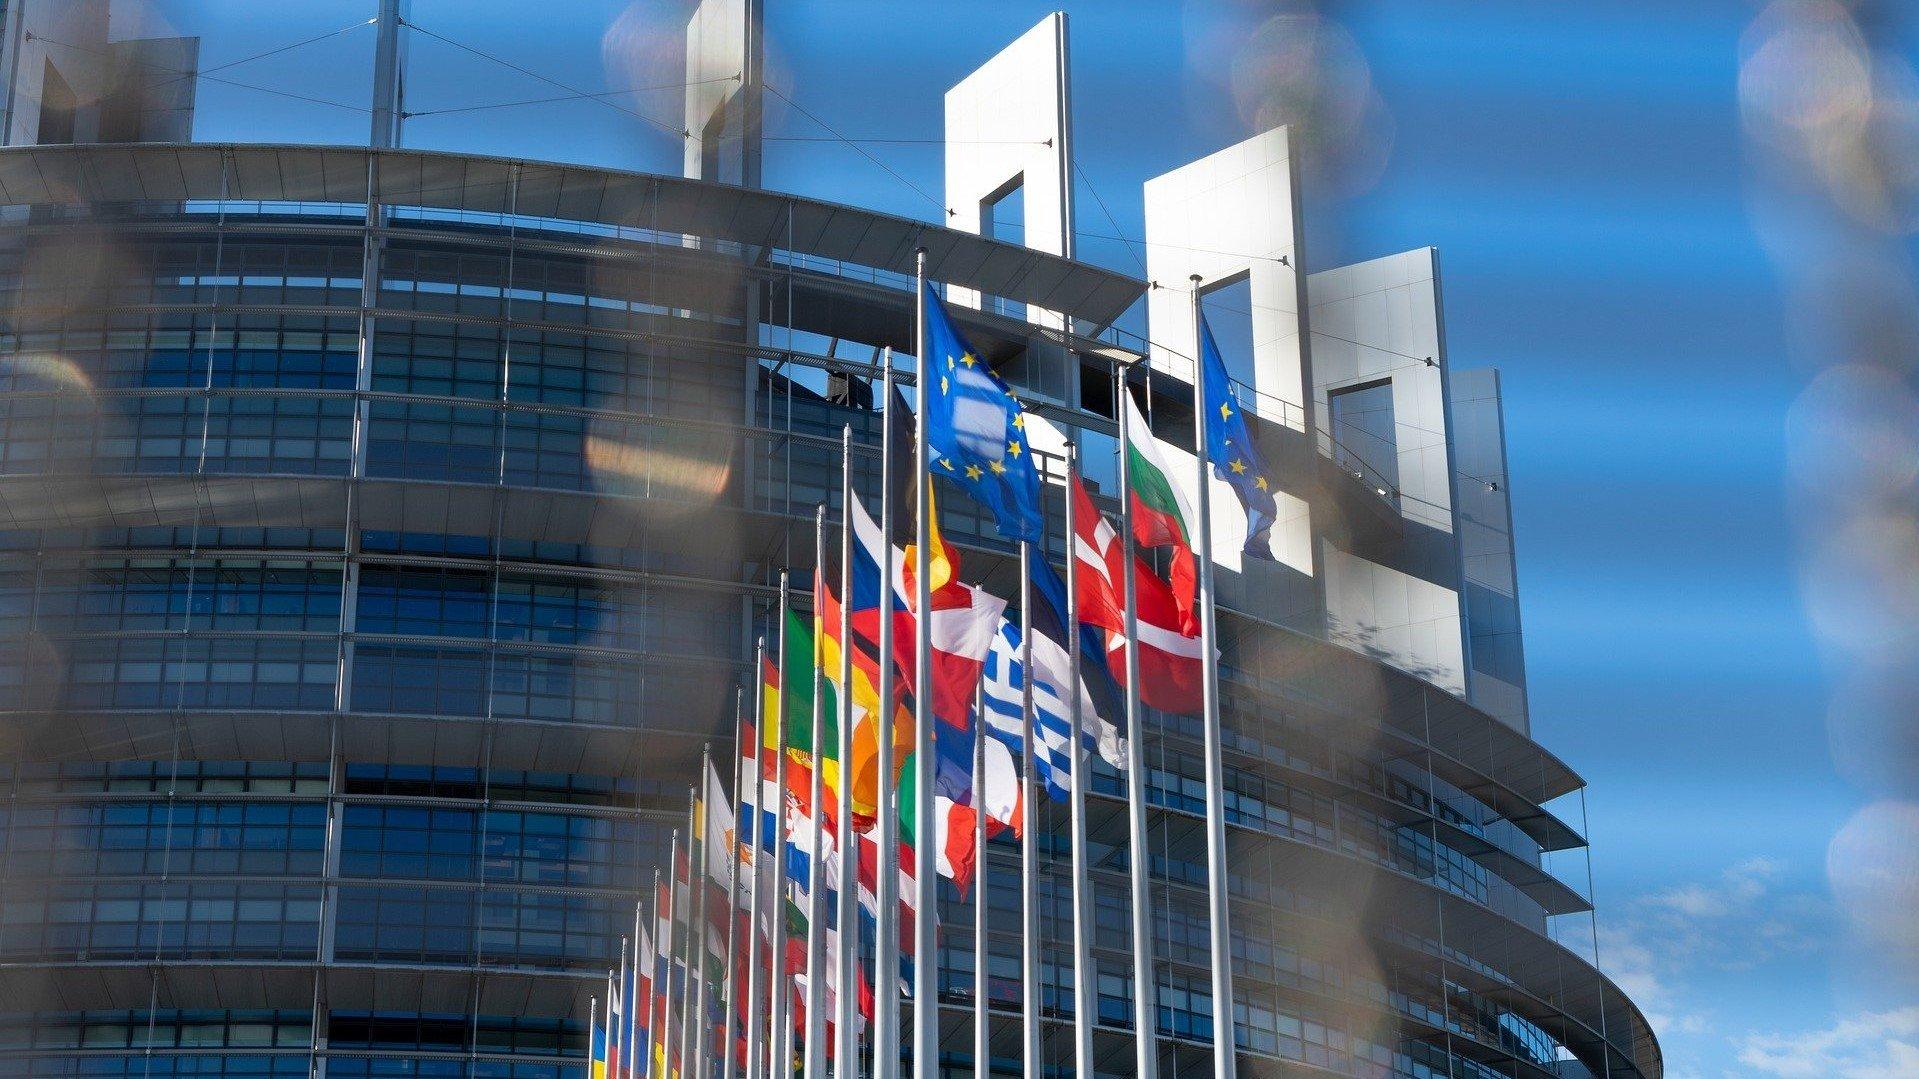 Evropský grantový příspěvek na ochranné známky